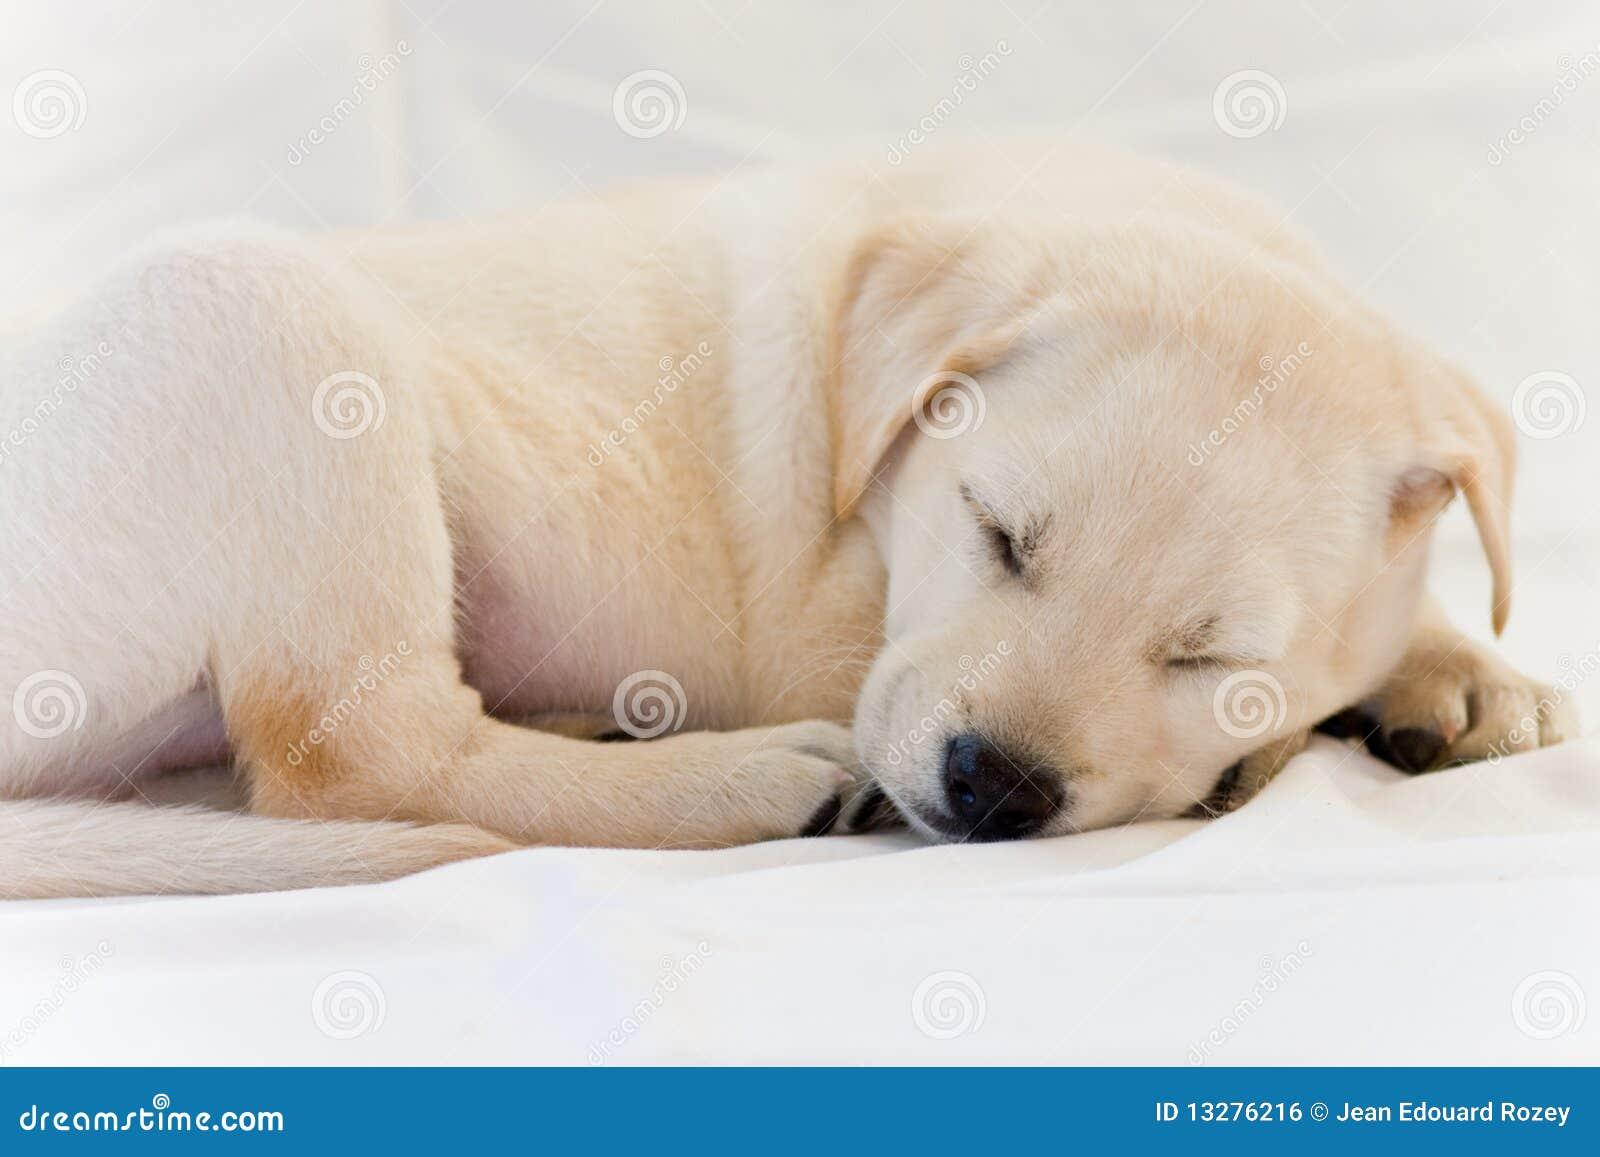 yellow lab puppy sleeping - photo #38